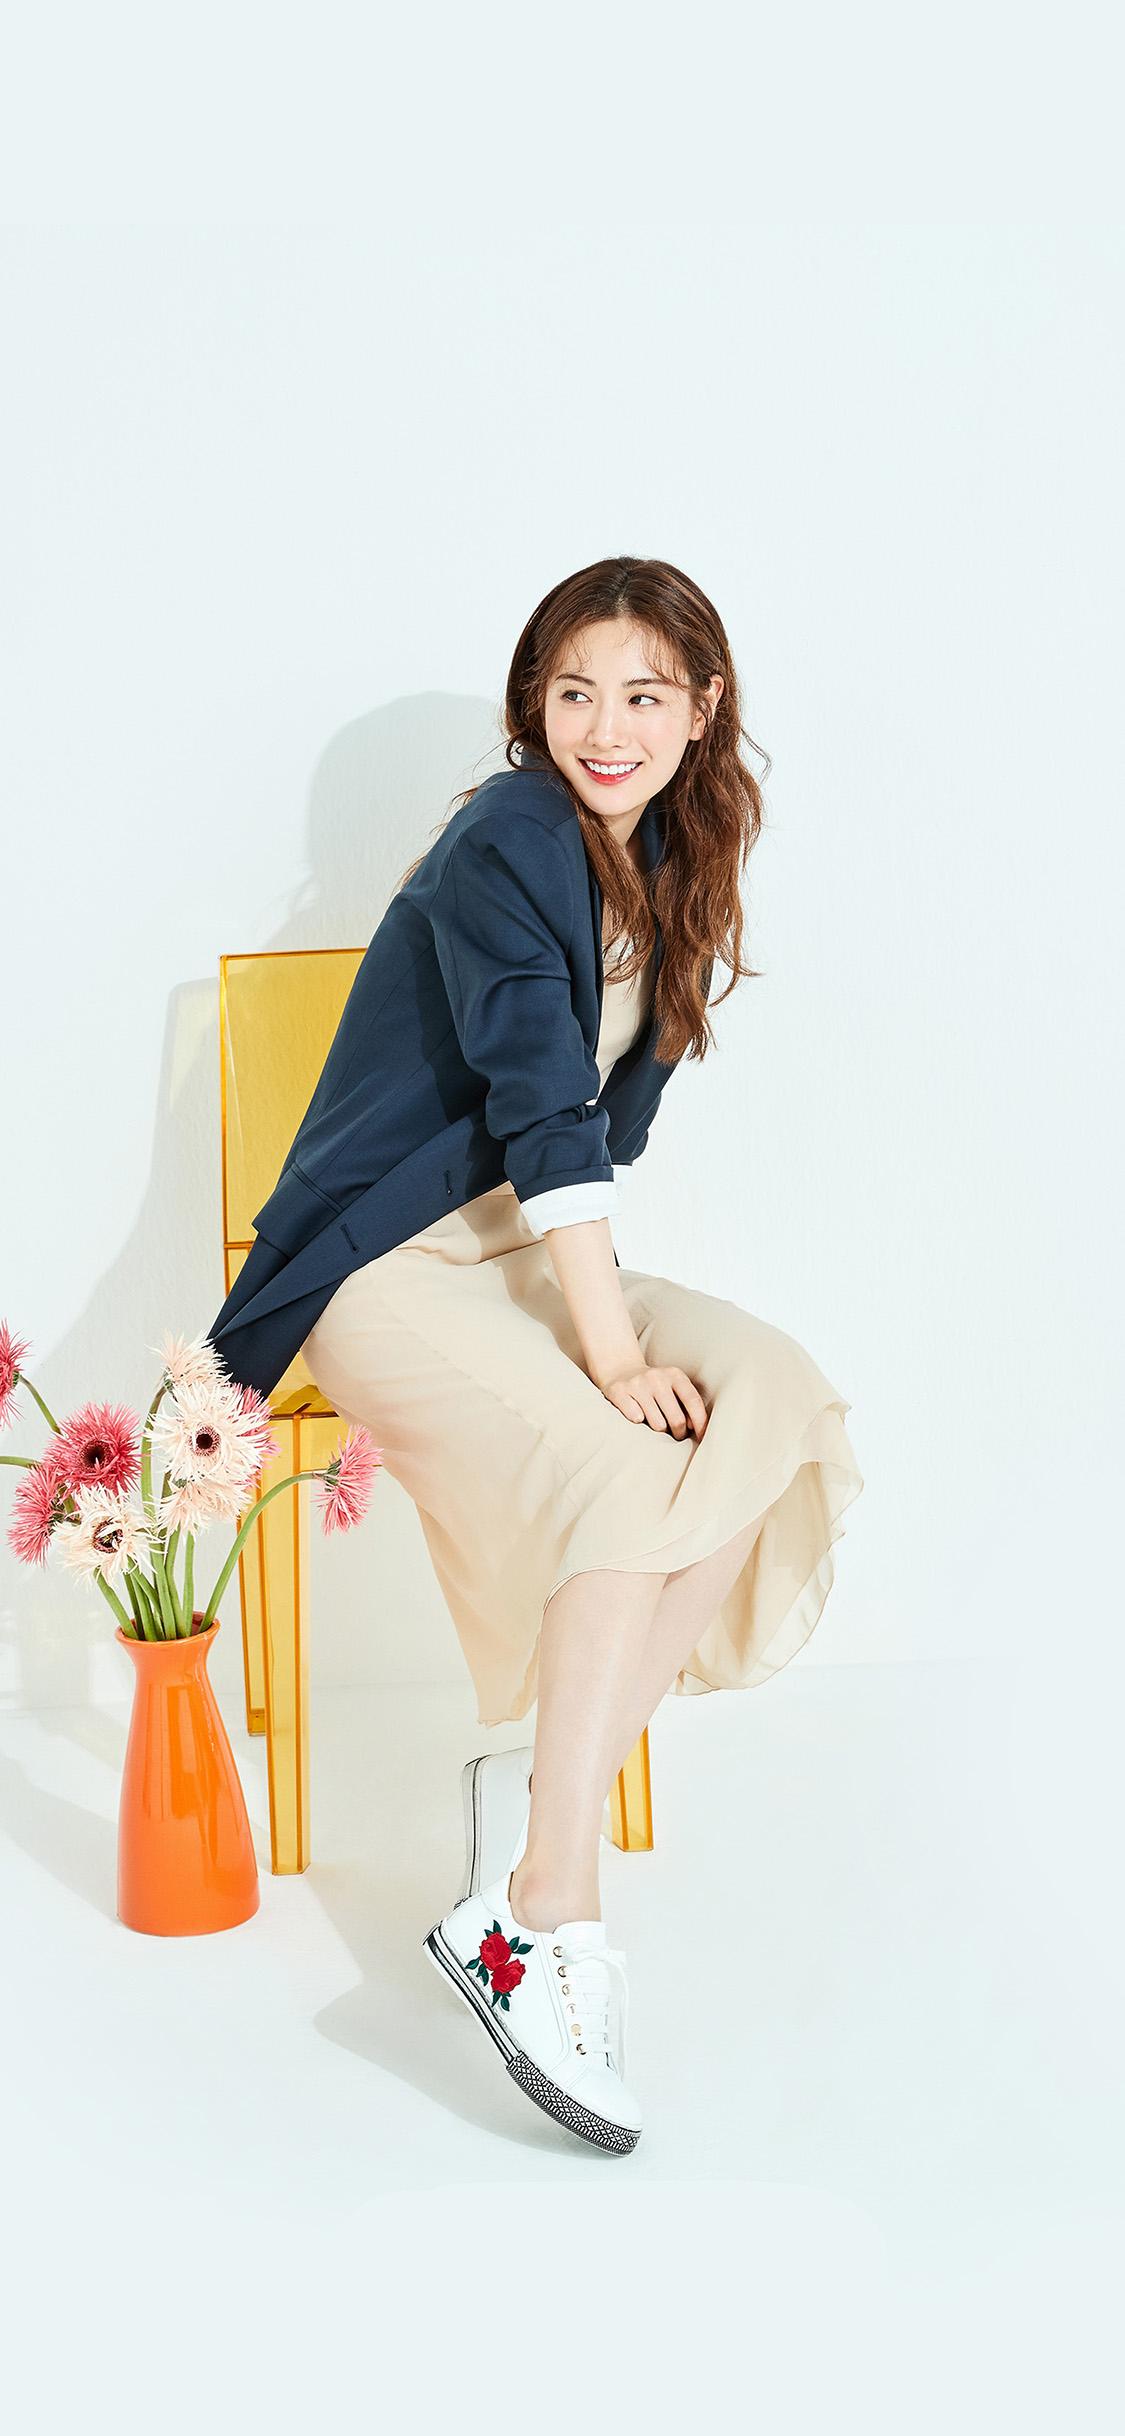 papers.co hr72 kpop girl korean cute 41 iphone wallpaper